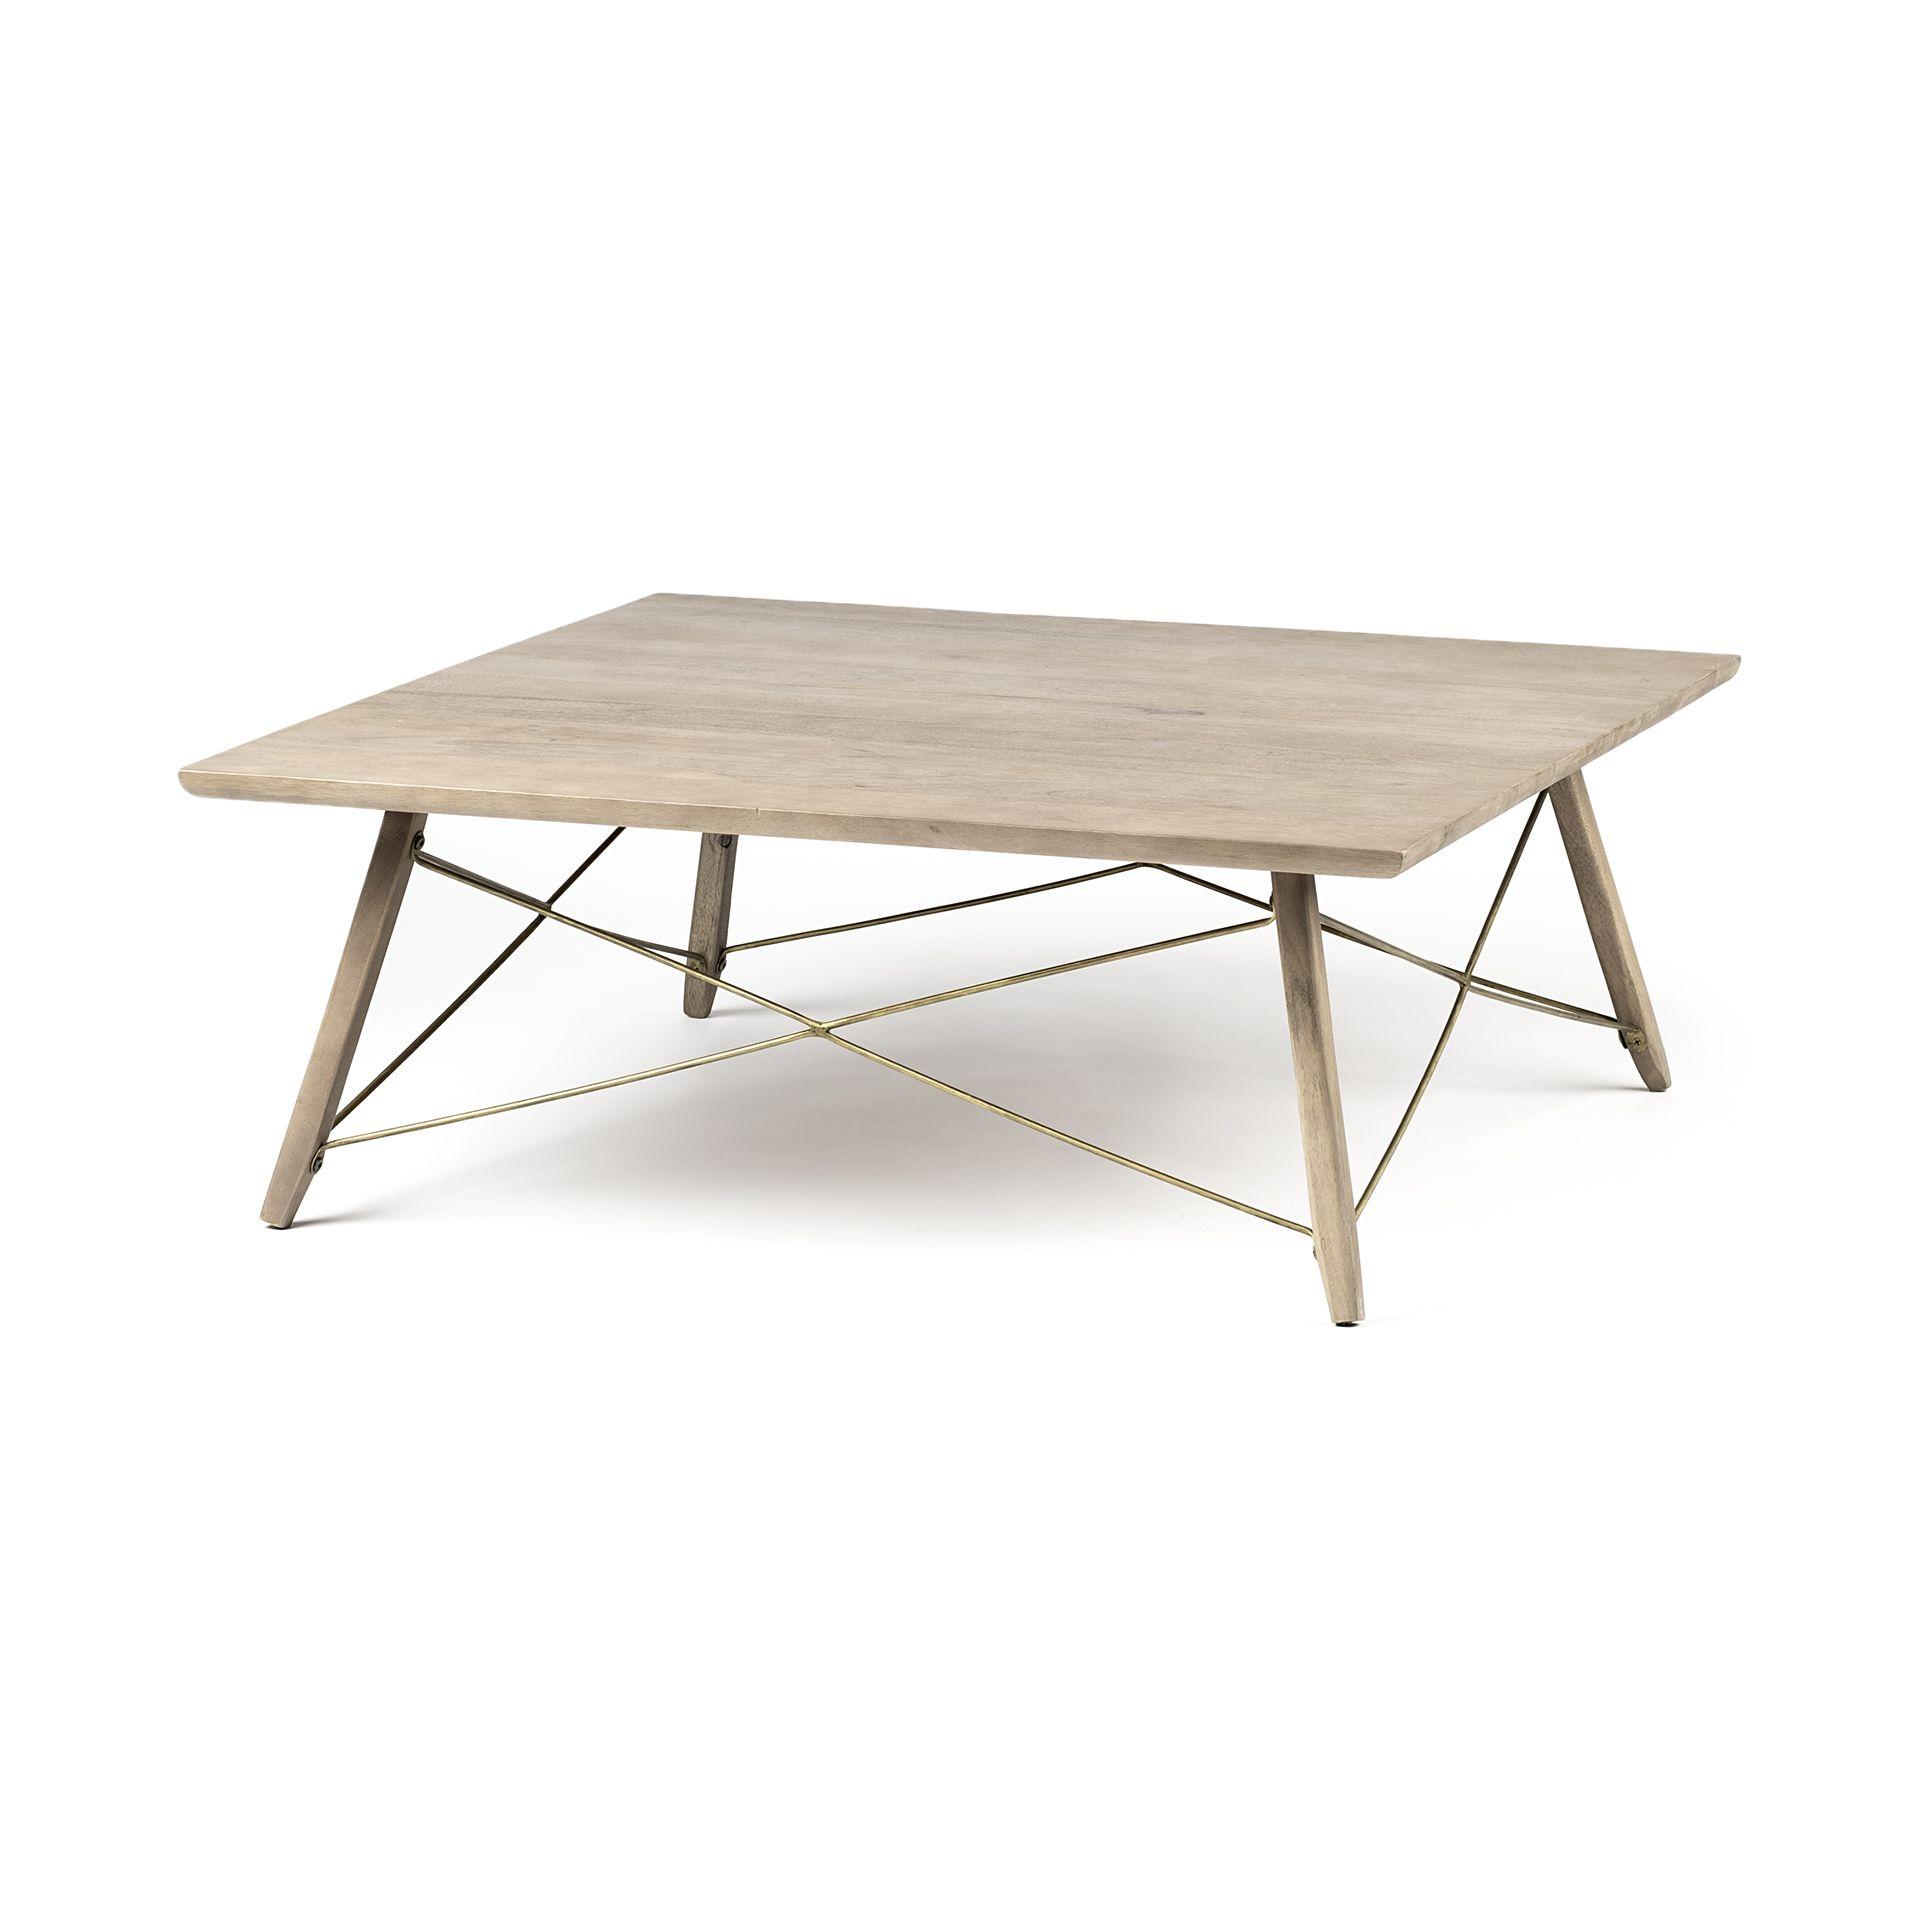 Mercana Kirby Ii Square Wood Coffee Table Wooden Coffee Table Coffee Table Wood [ 1920 x 1920 Pixel ]